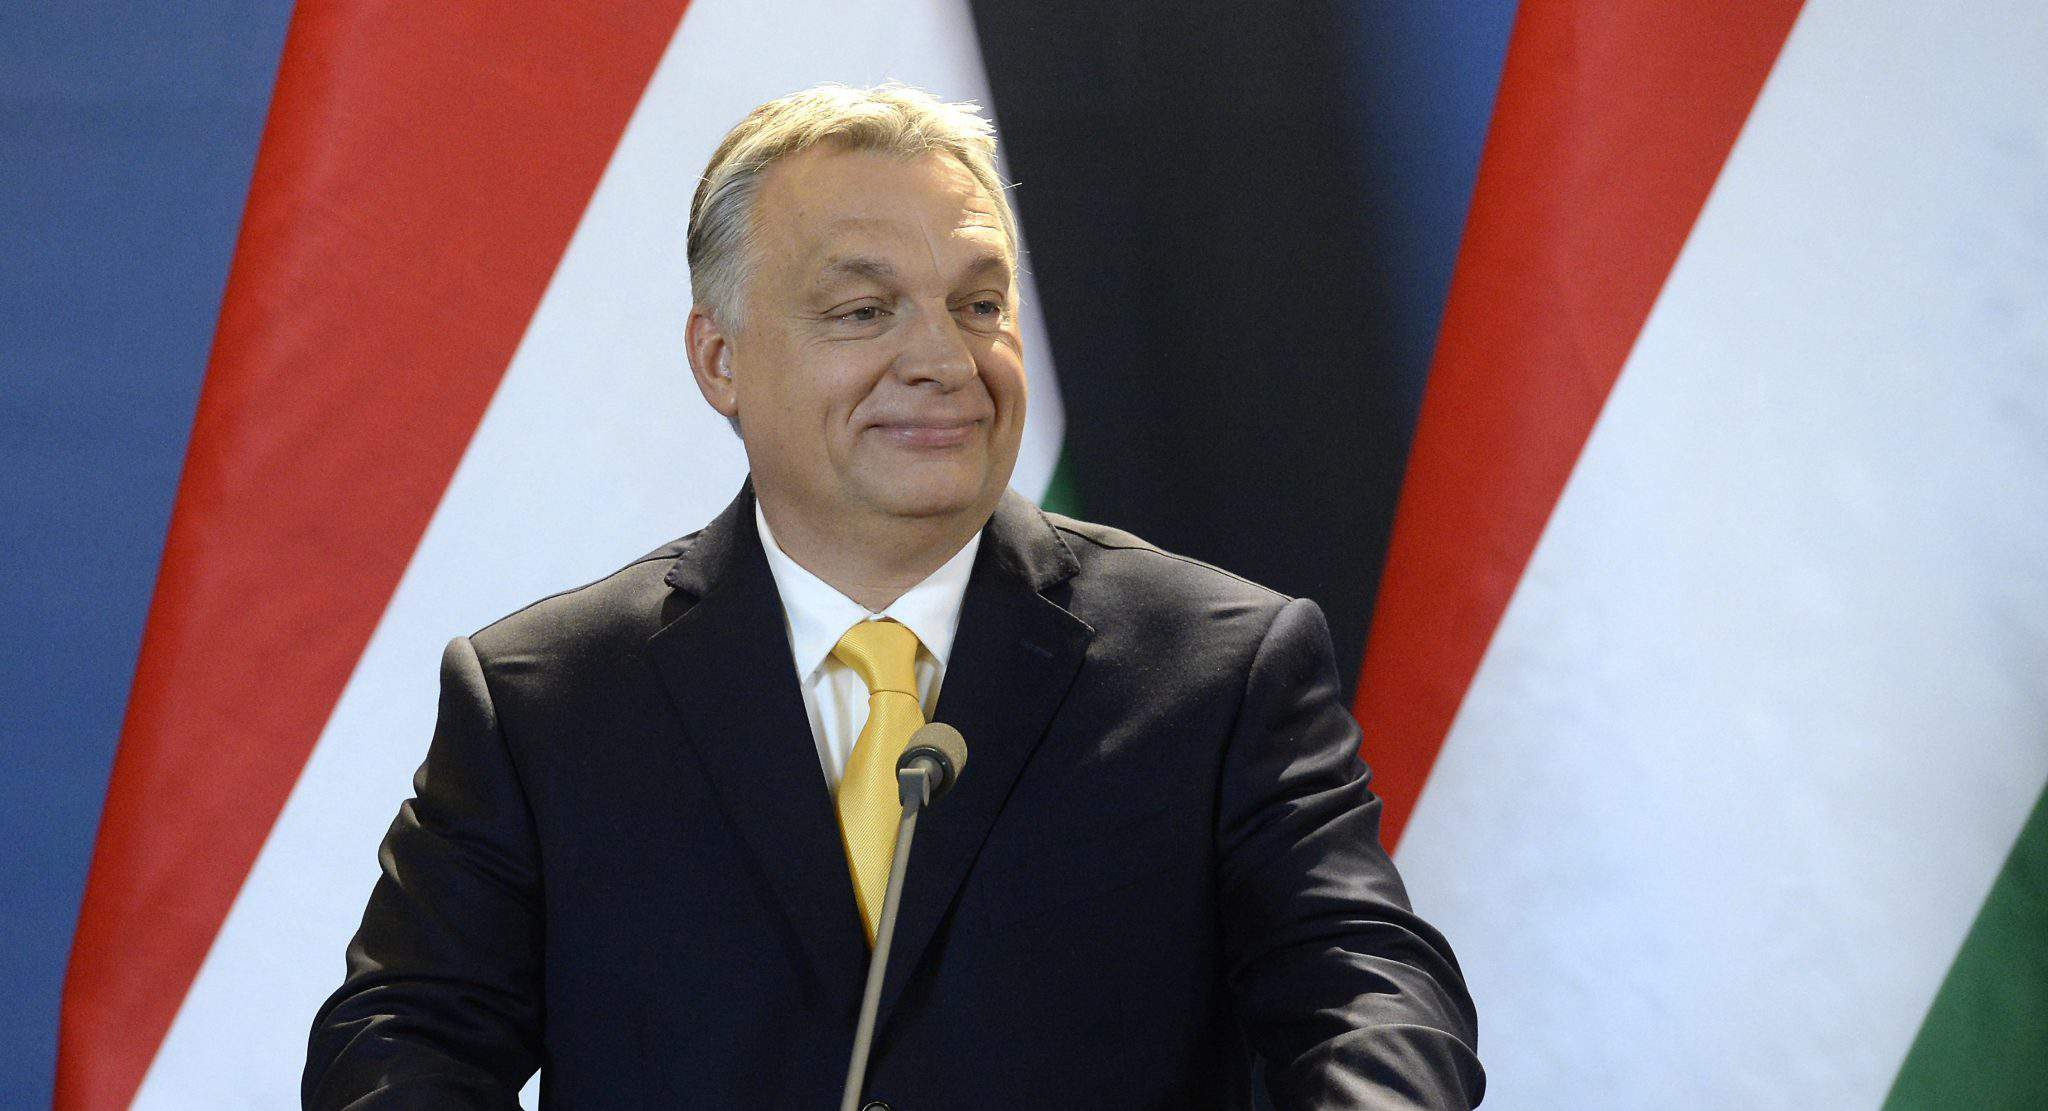 Viktor Orbán Fidesz election2018